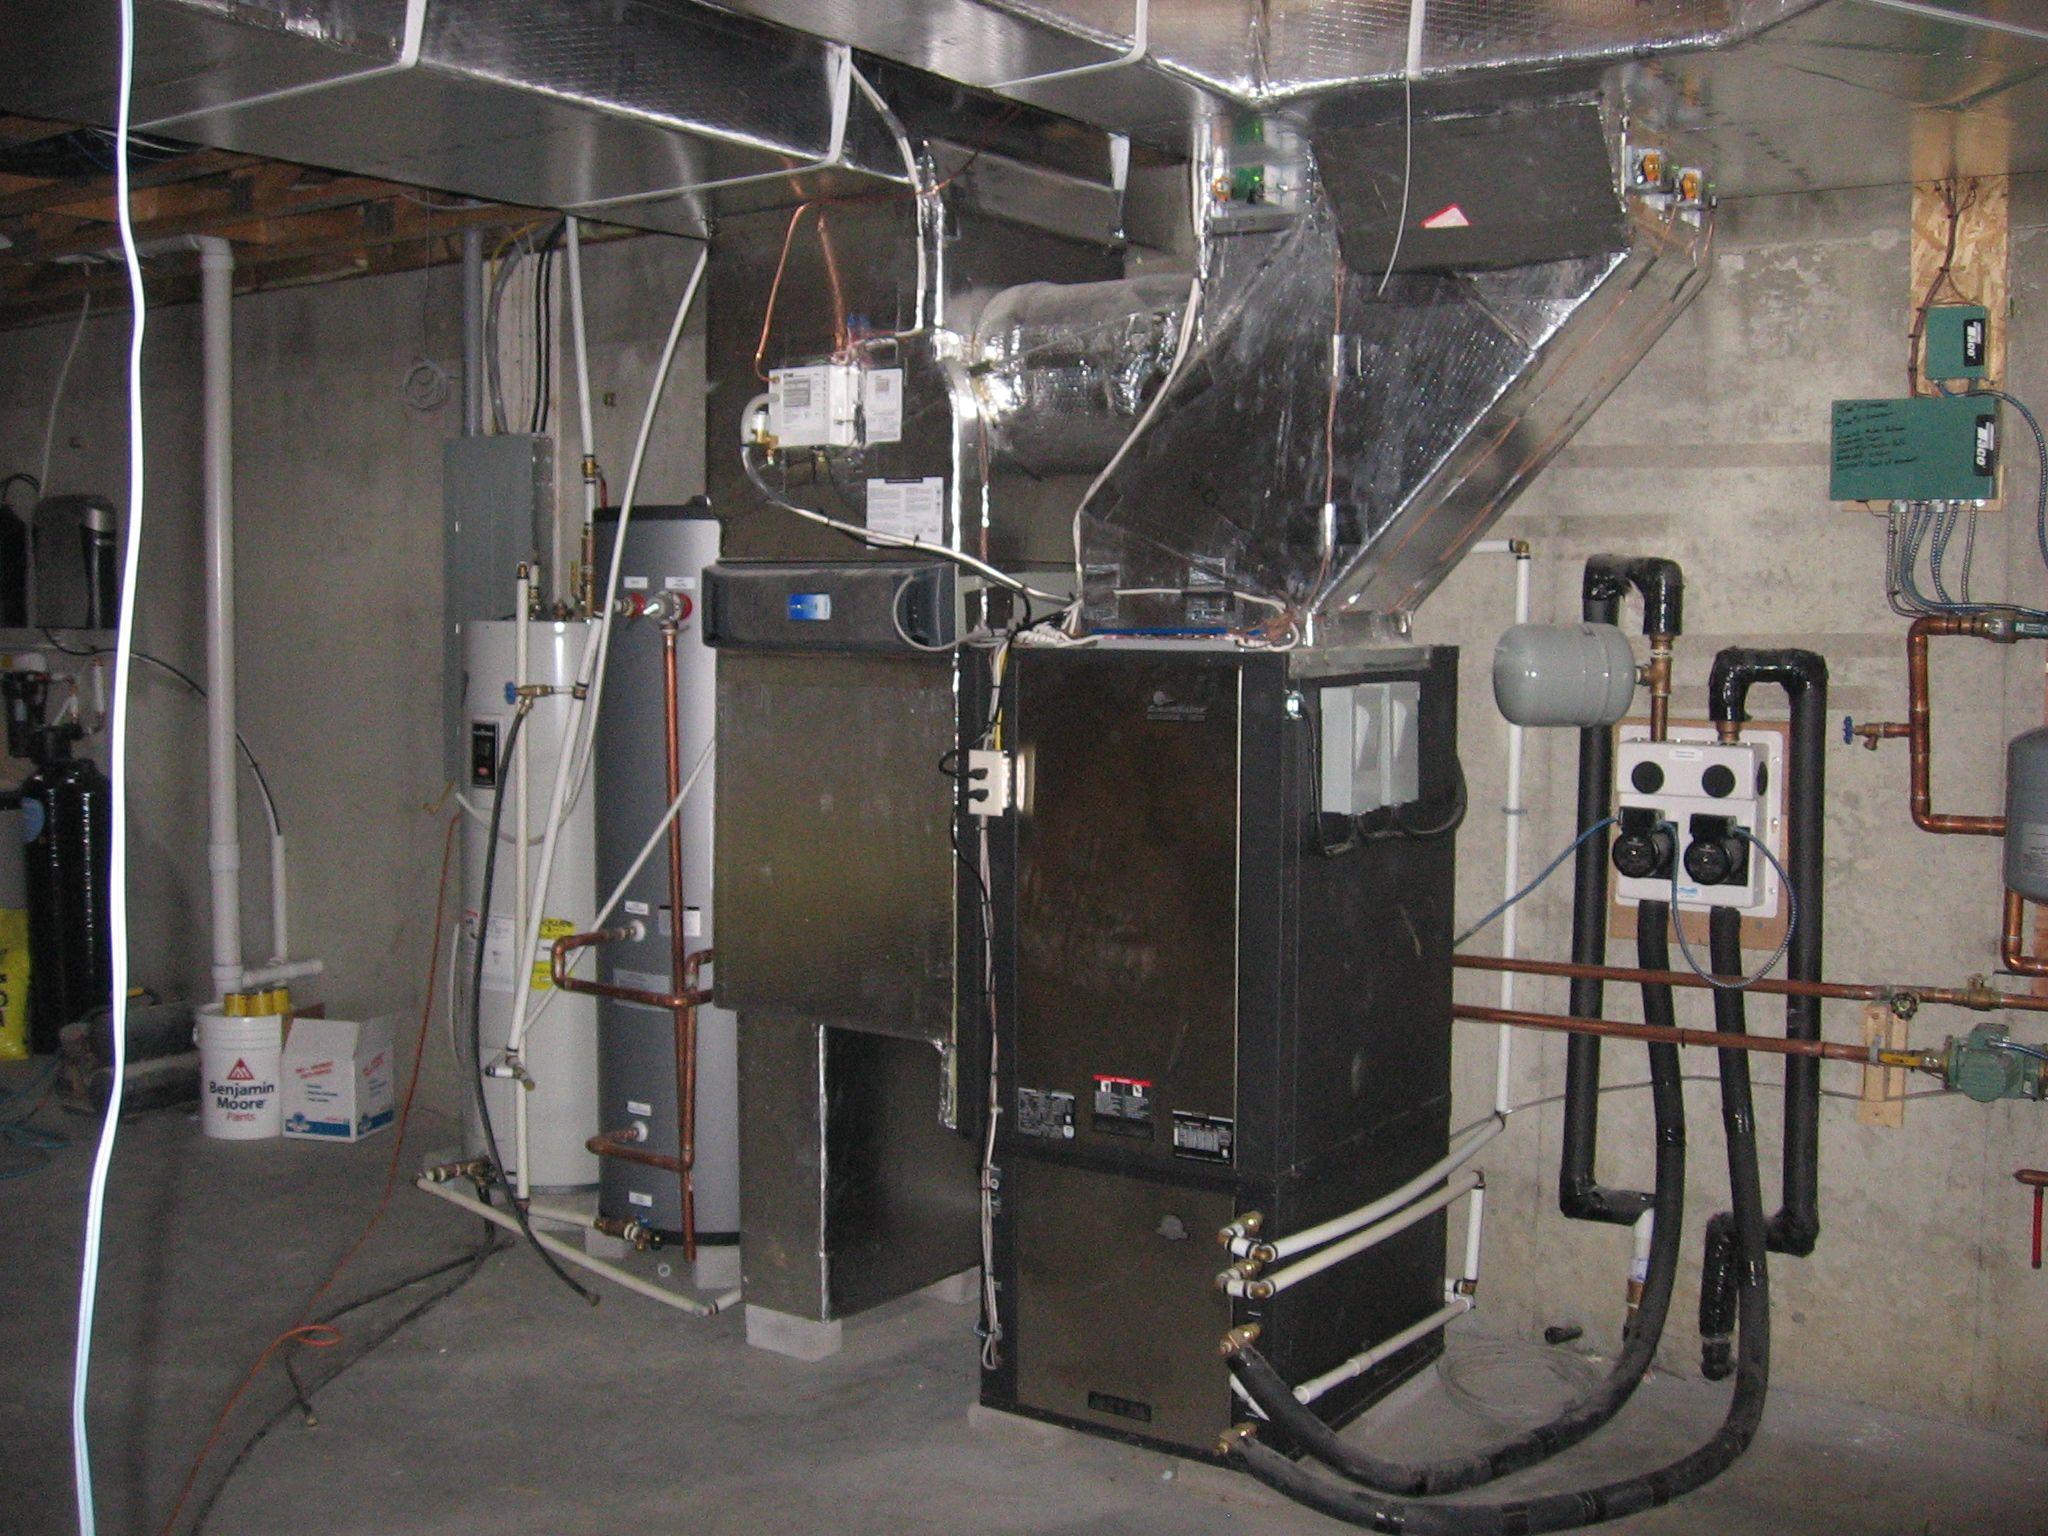 Heating Service Heating services, Hvac services, Air